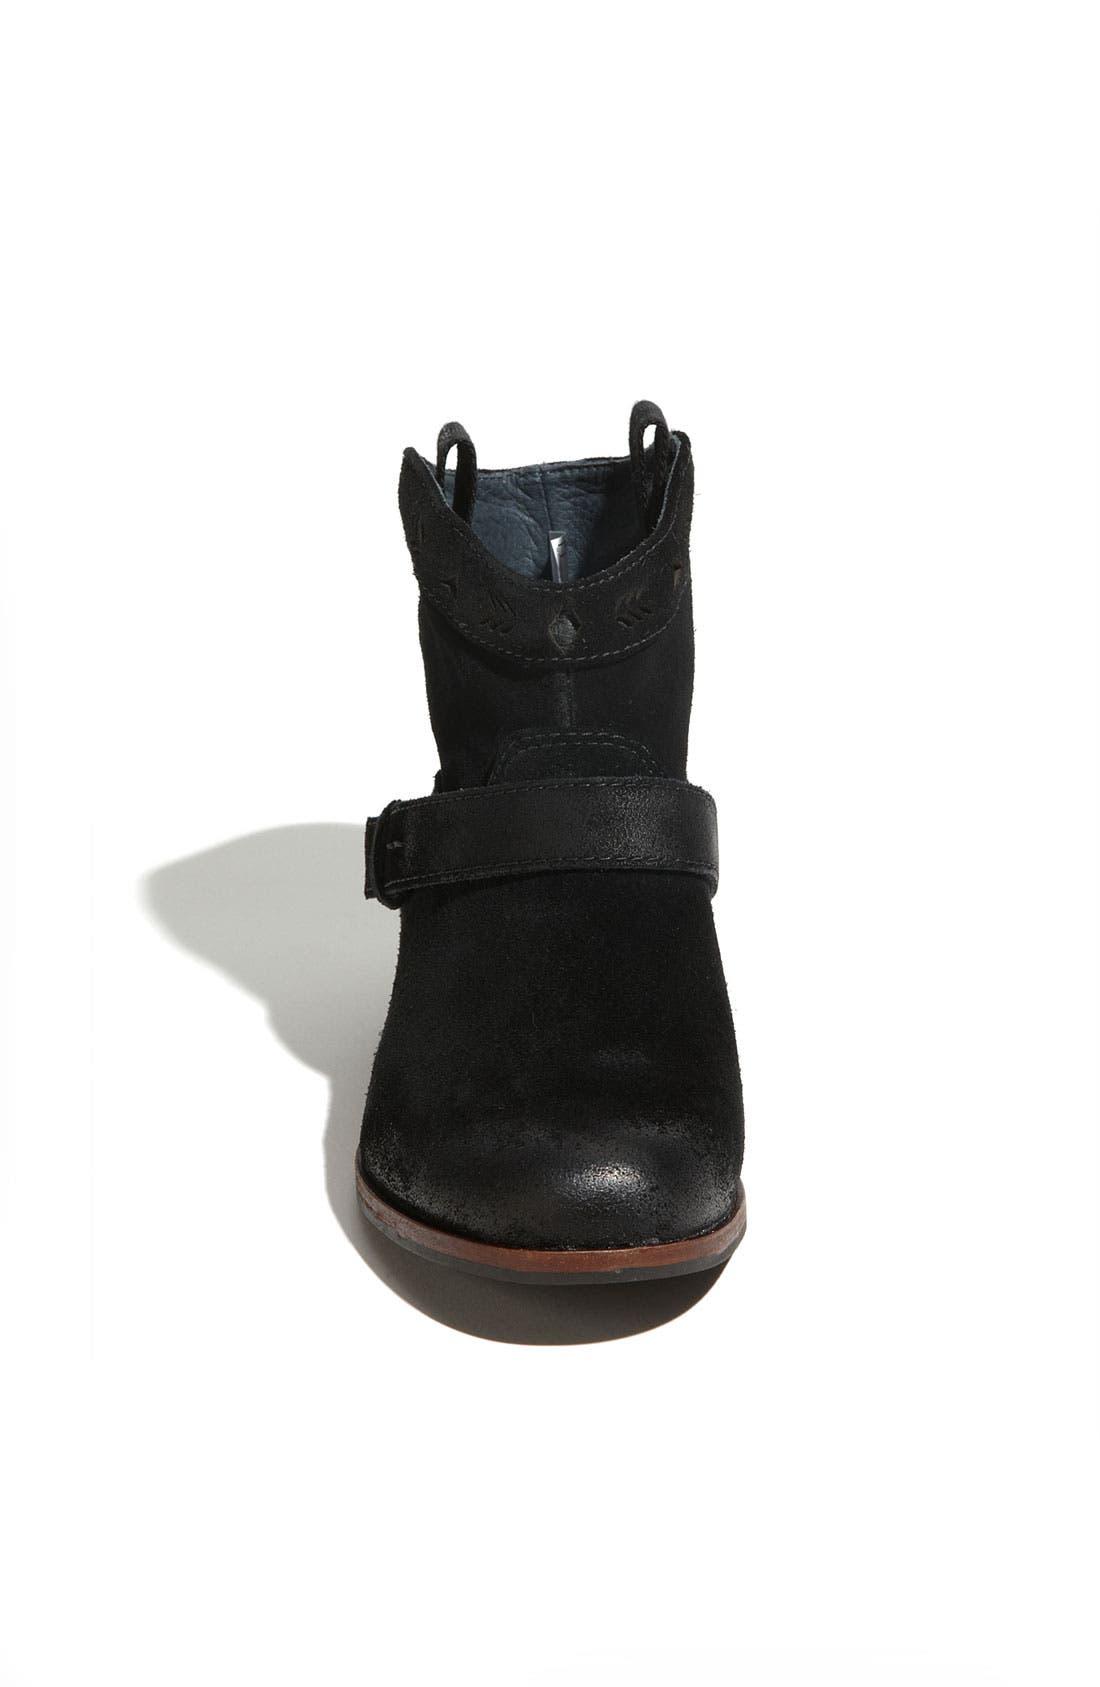 Australia 'Austin' Ankle Boot,                             Alternate thumbnail 2, color,                             001